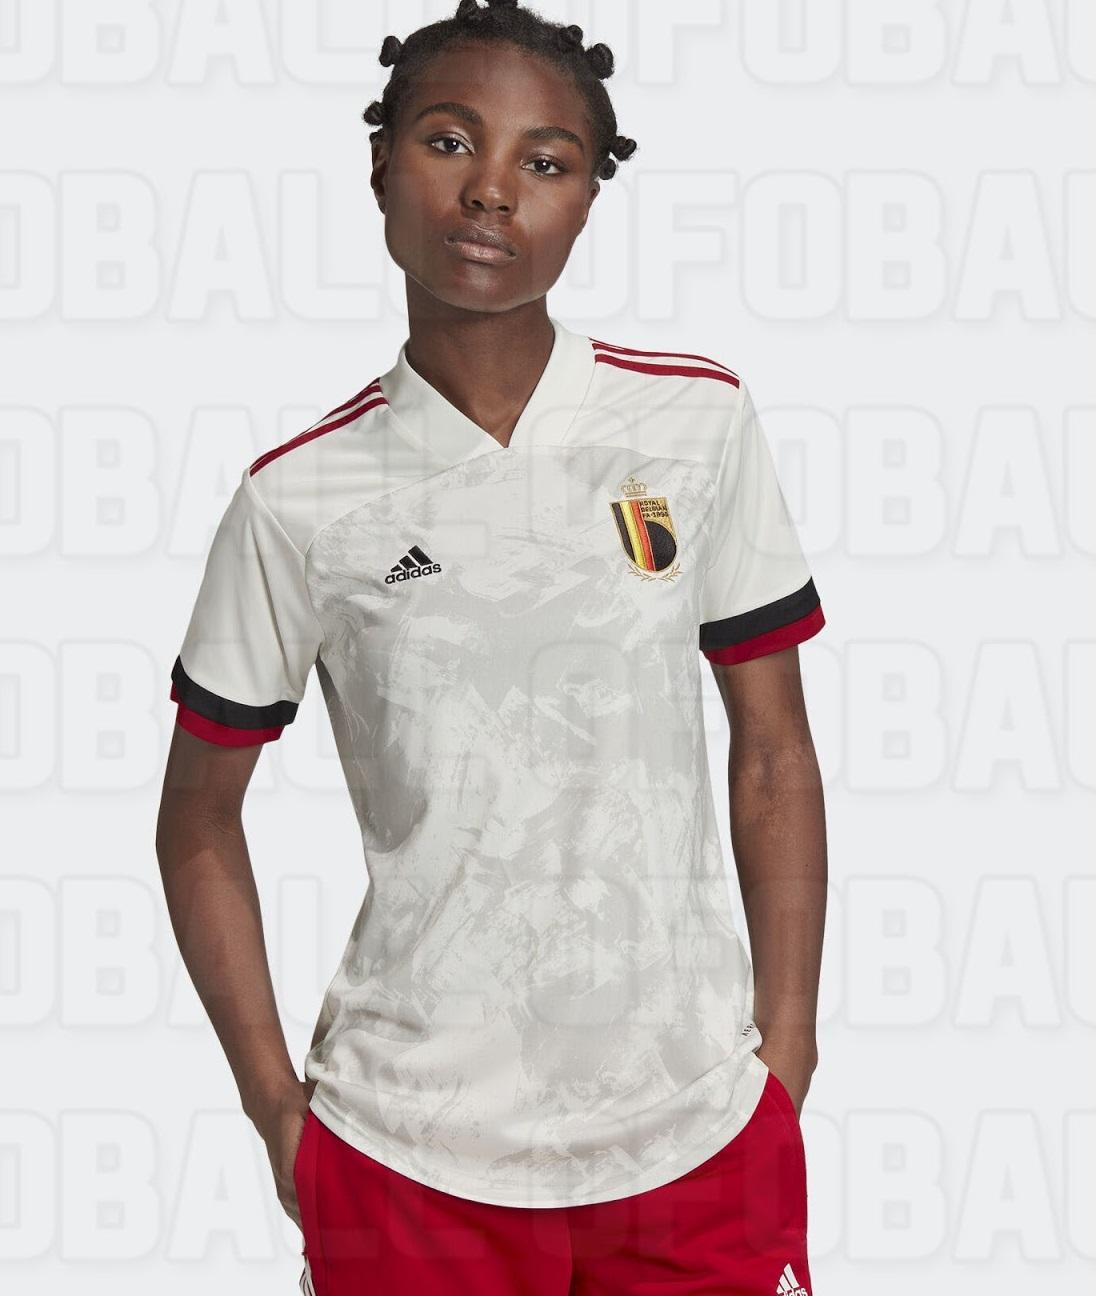 Belgique Euro 2020 maillot foot exterieur Adidas femme